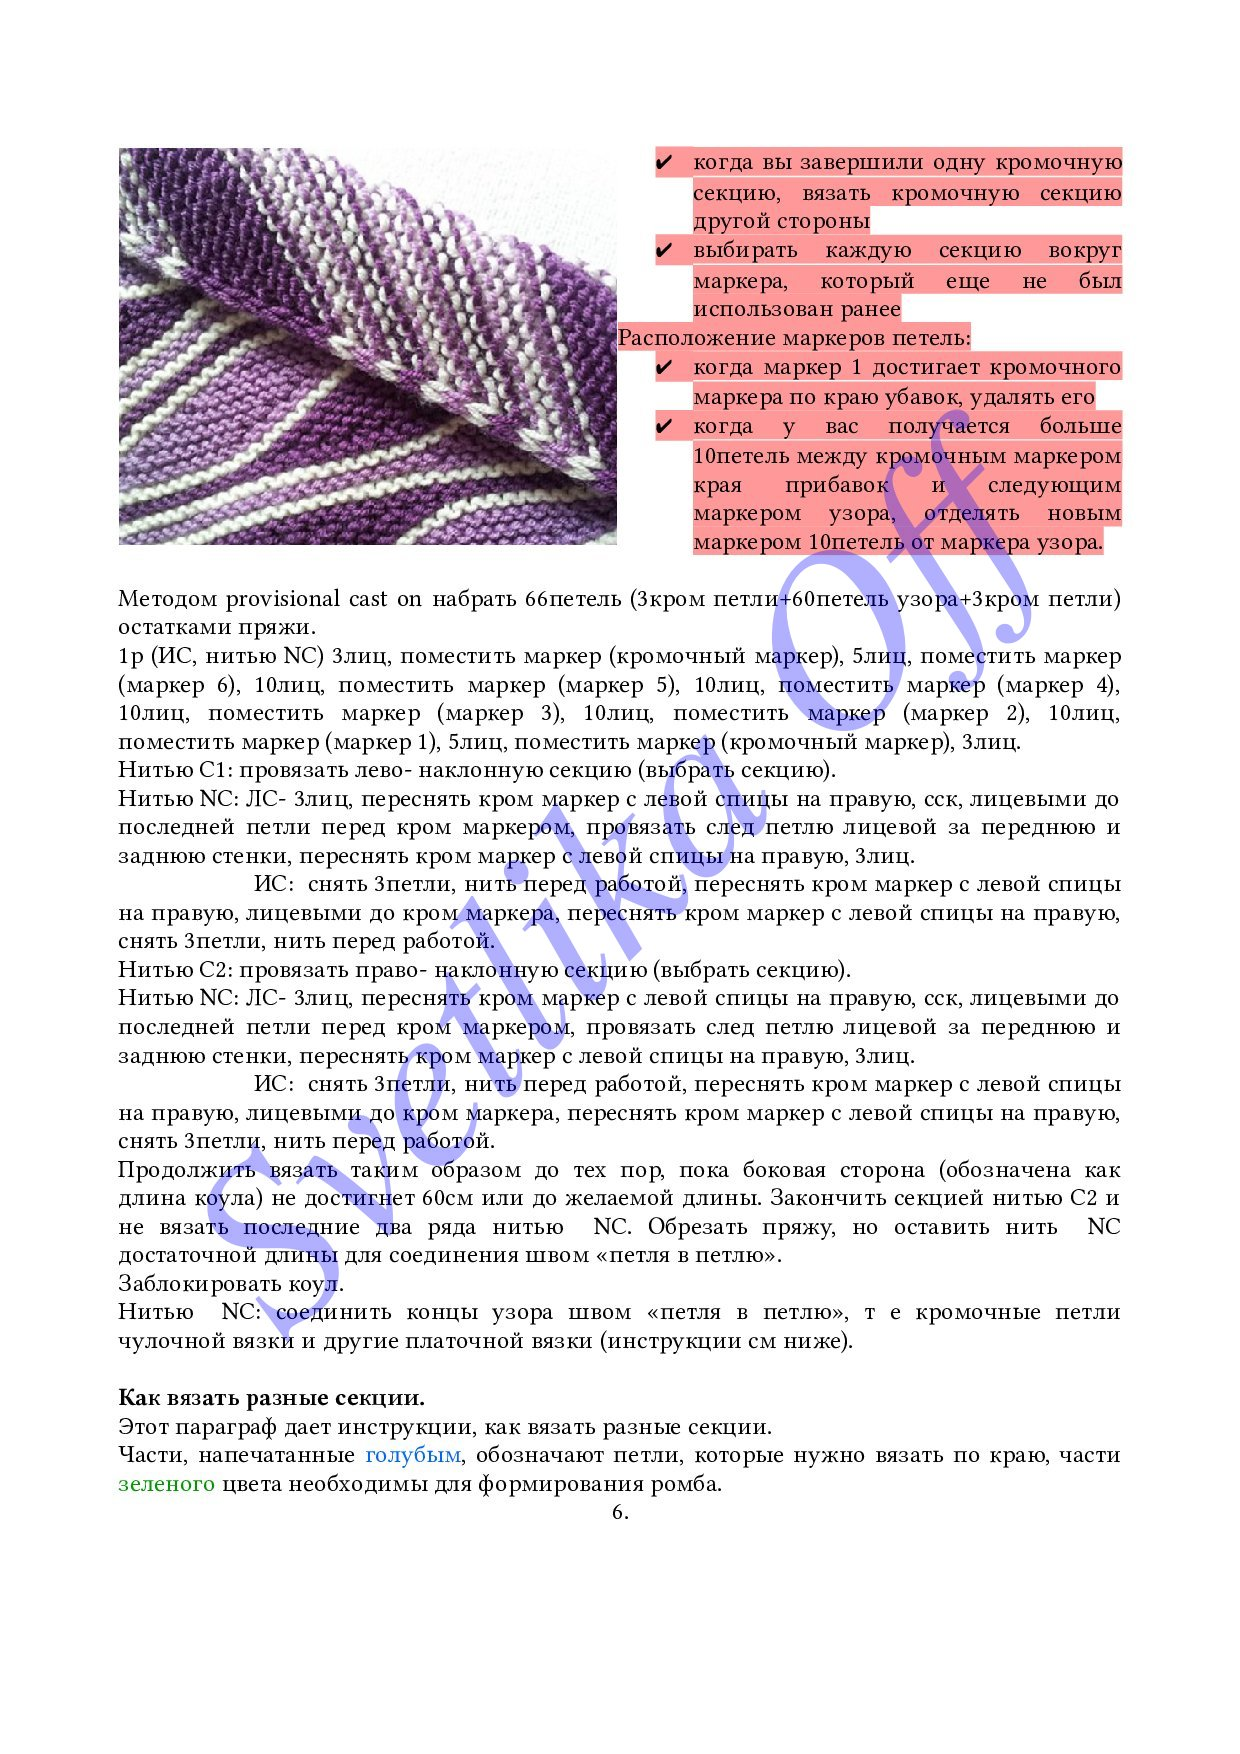 https://img-fotki.yandex.ru/get/9106/125862467.93/0_1abcbb_56431d93_orig